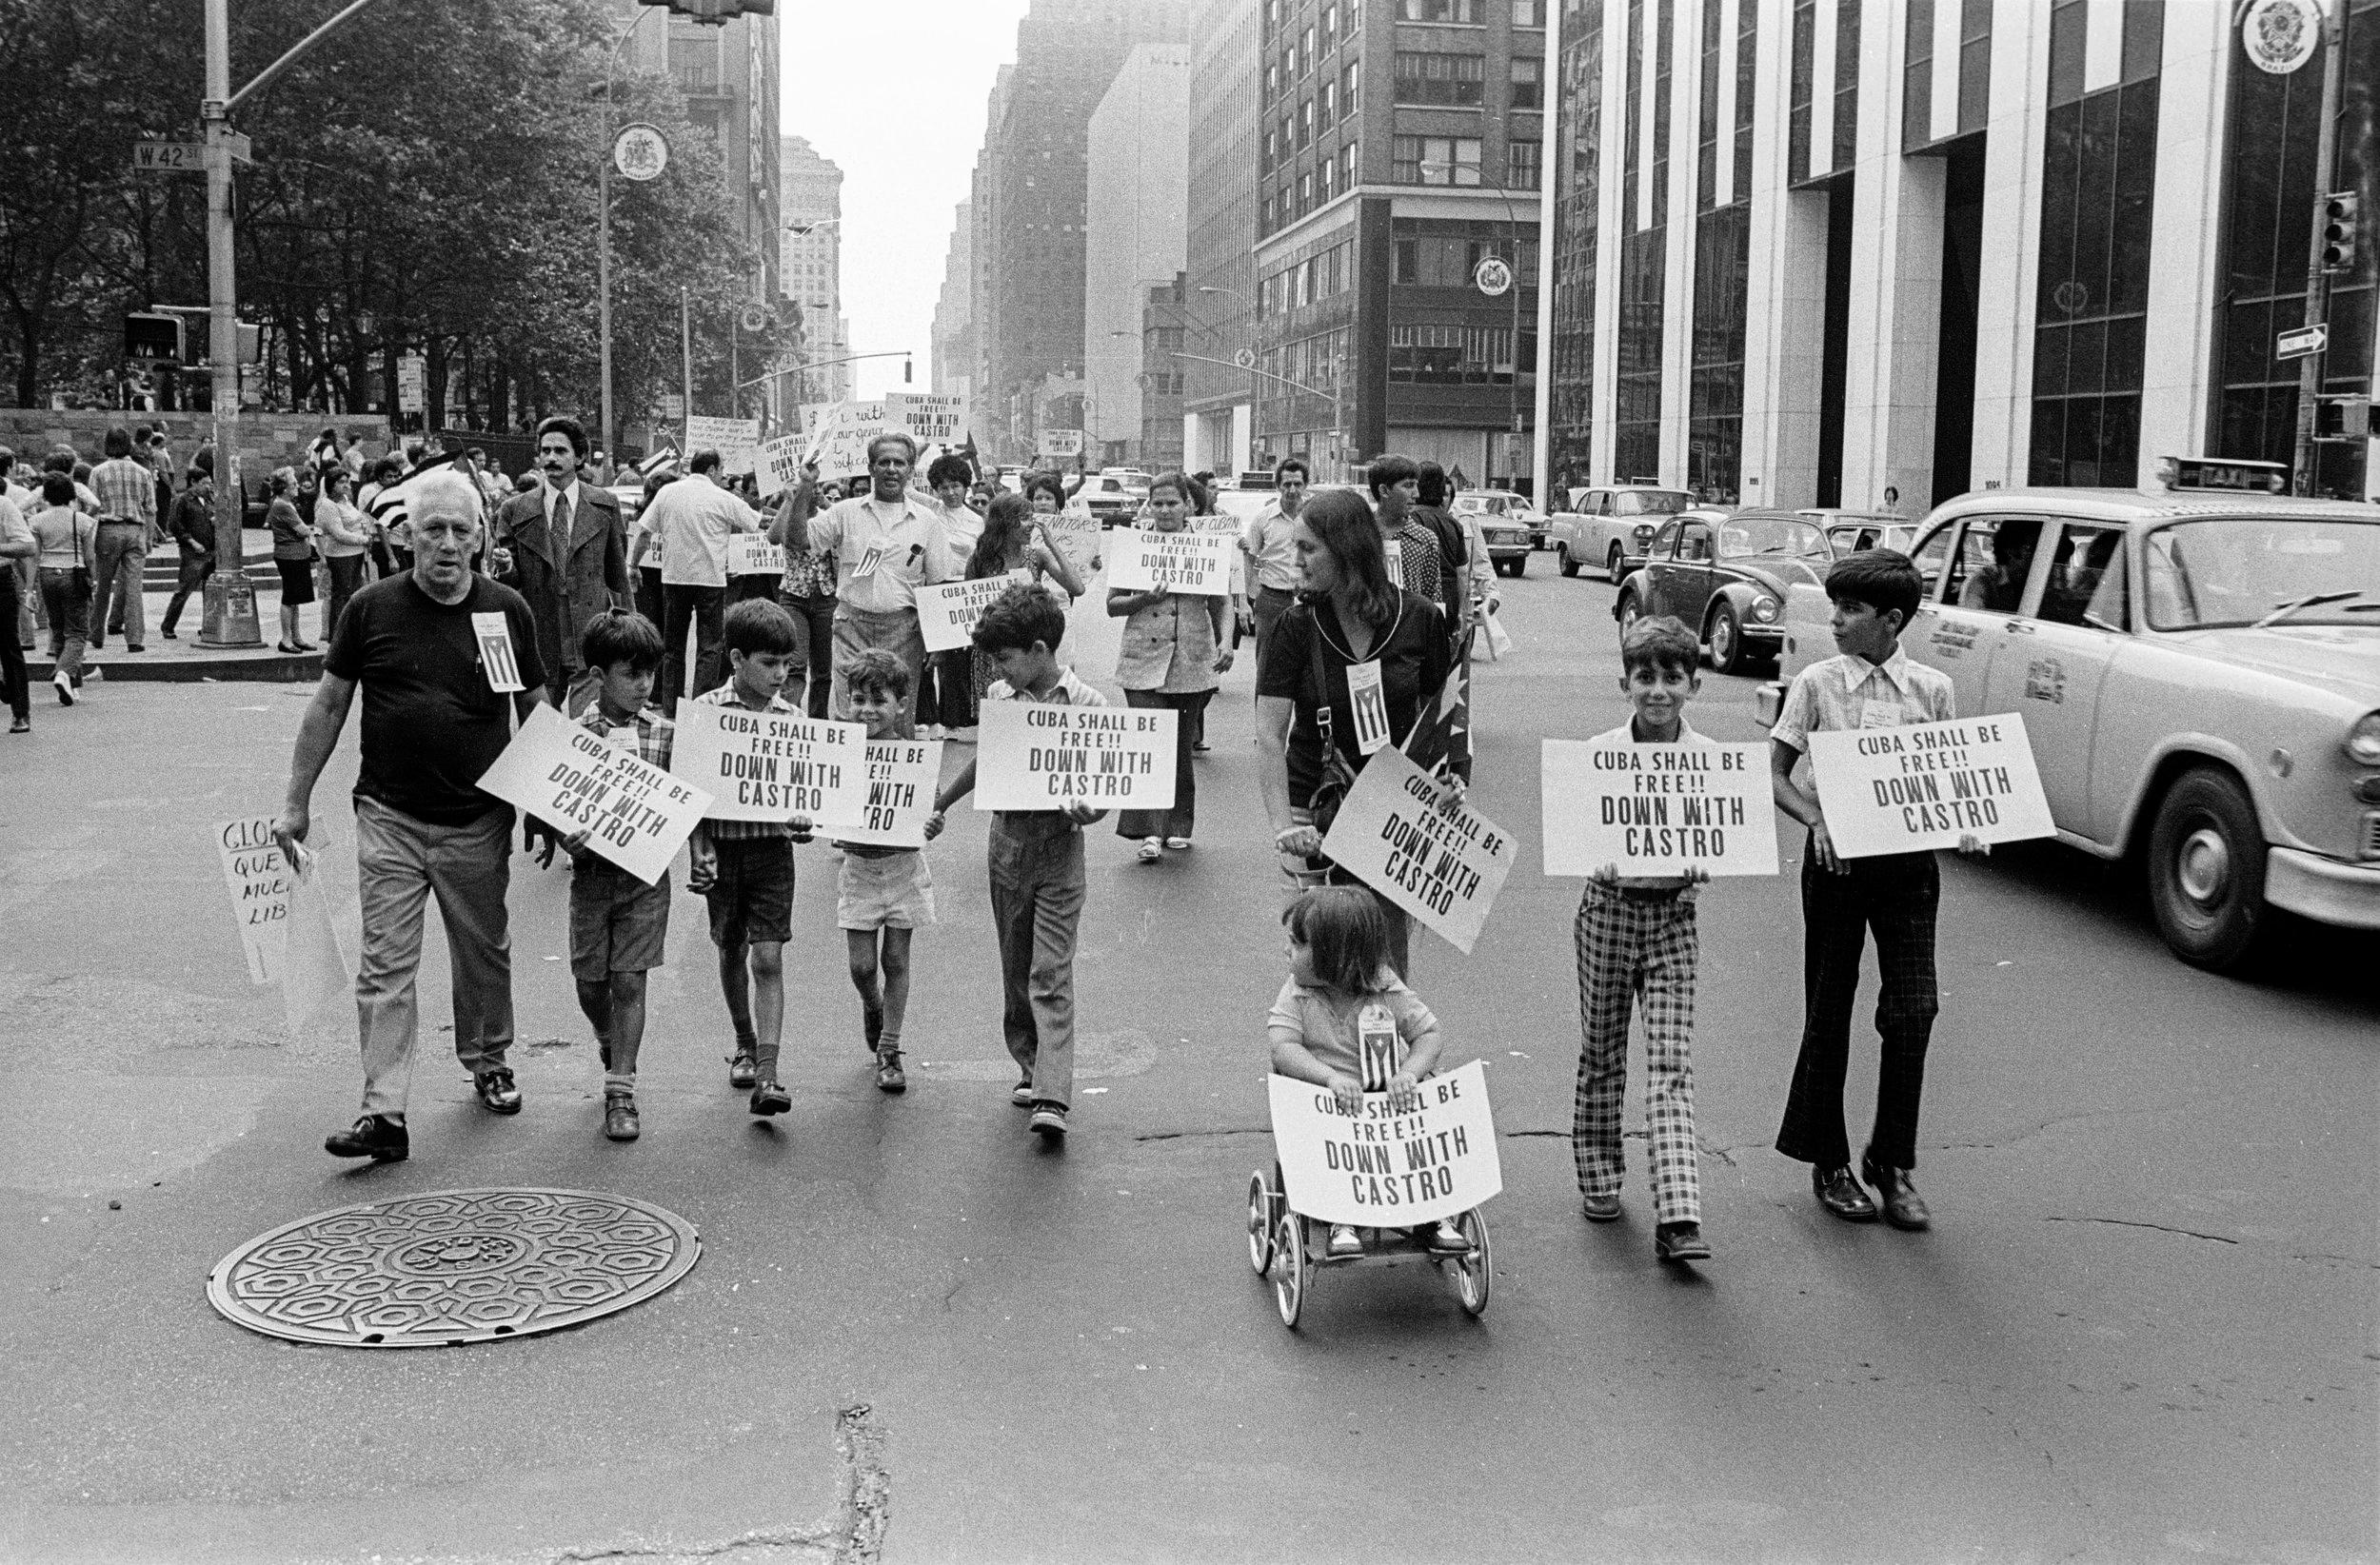 Cuba Demonstration, 1975